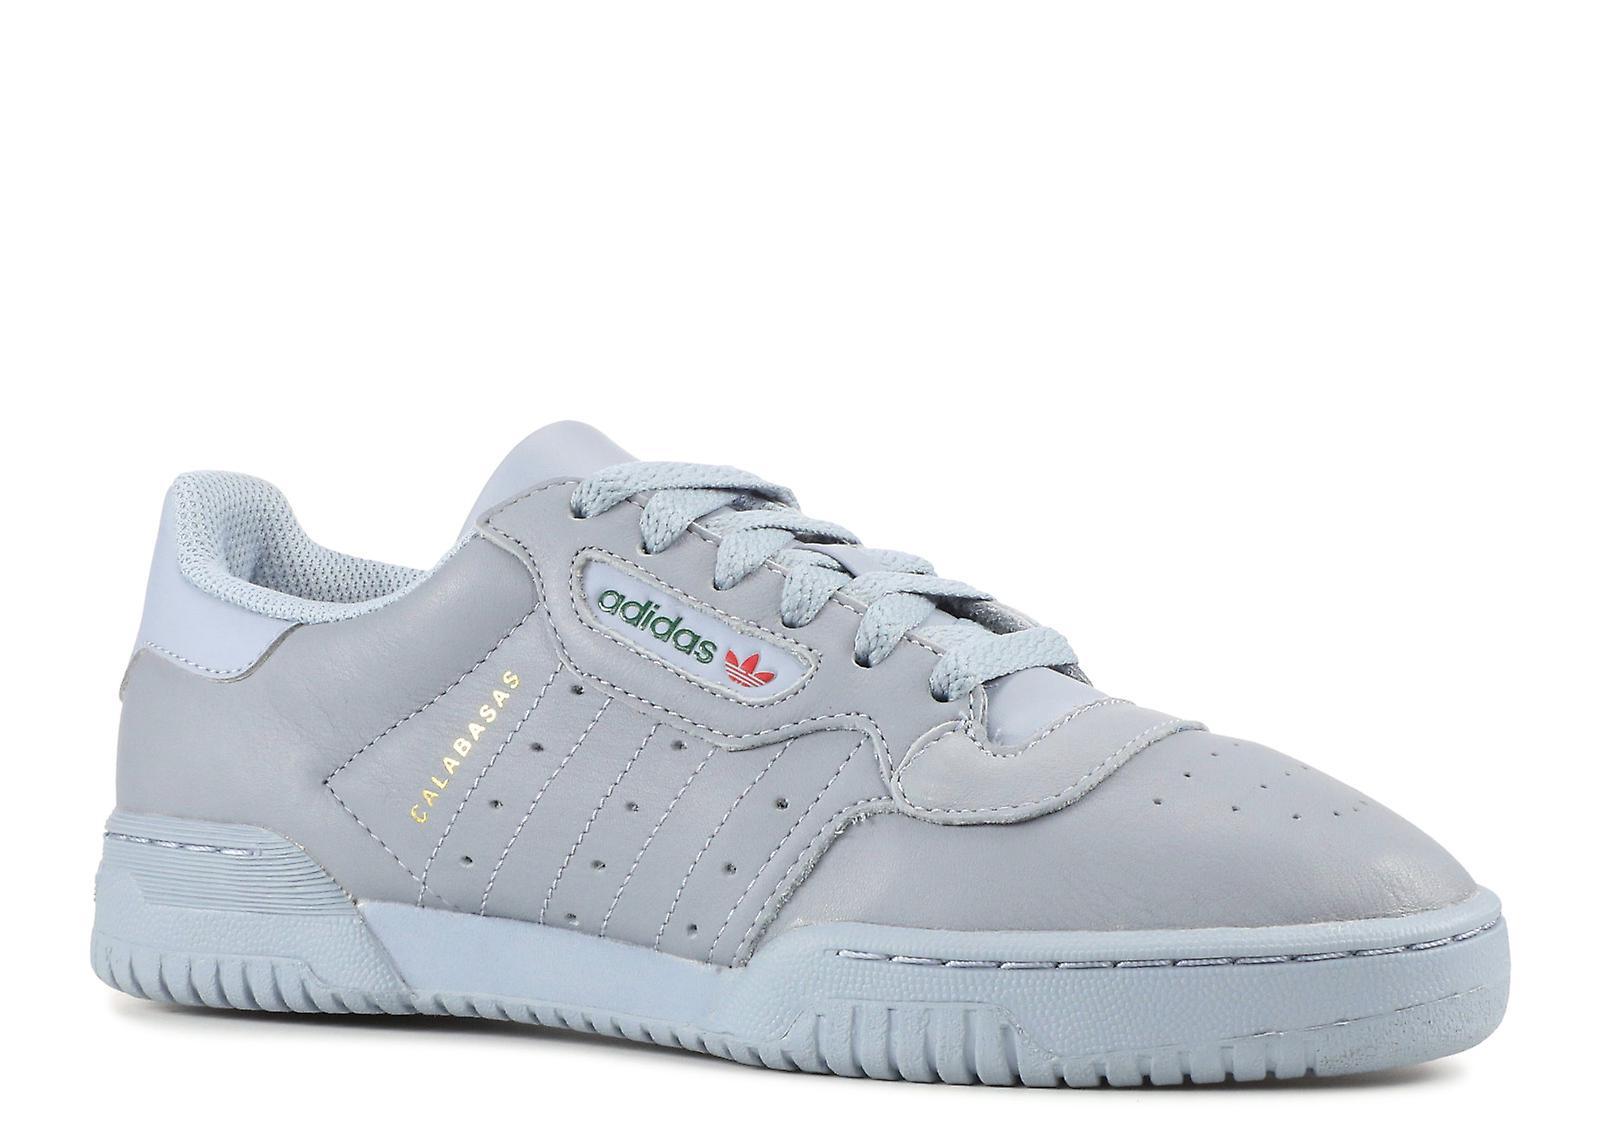 Adidas Yeezy Powerphase 'Calabasas Grey